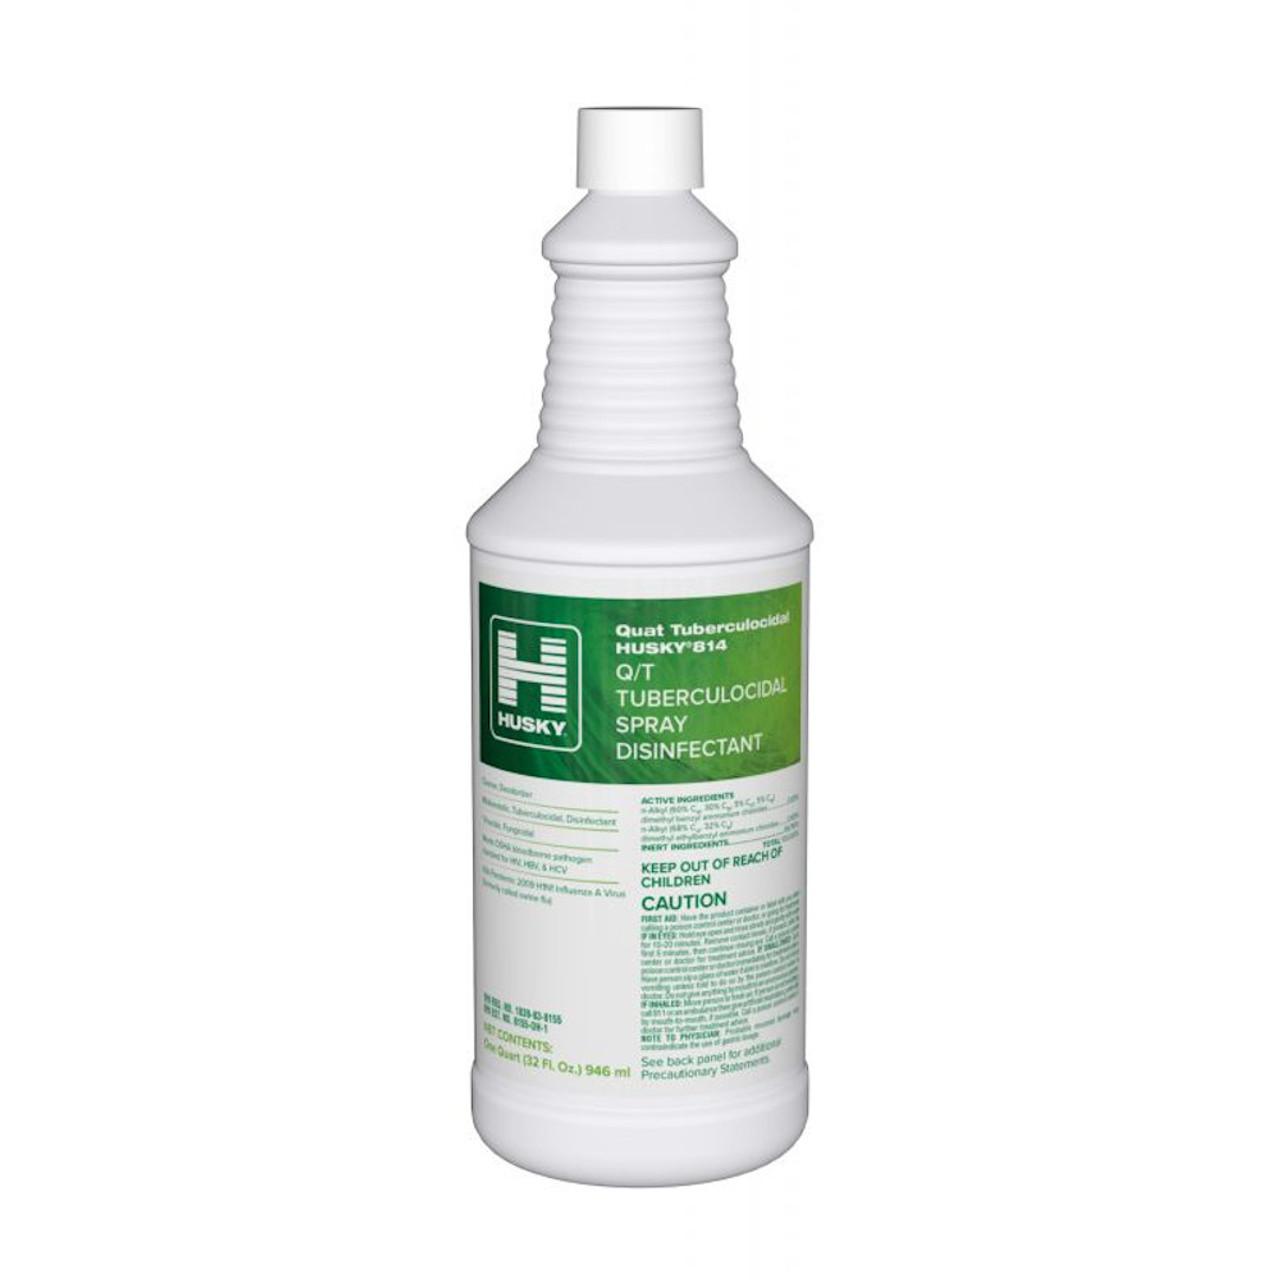 Husky 814 Q/T Tuberculocidal Spray Disinfectant Kills the dreaded Norovirus!